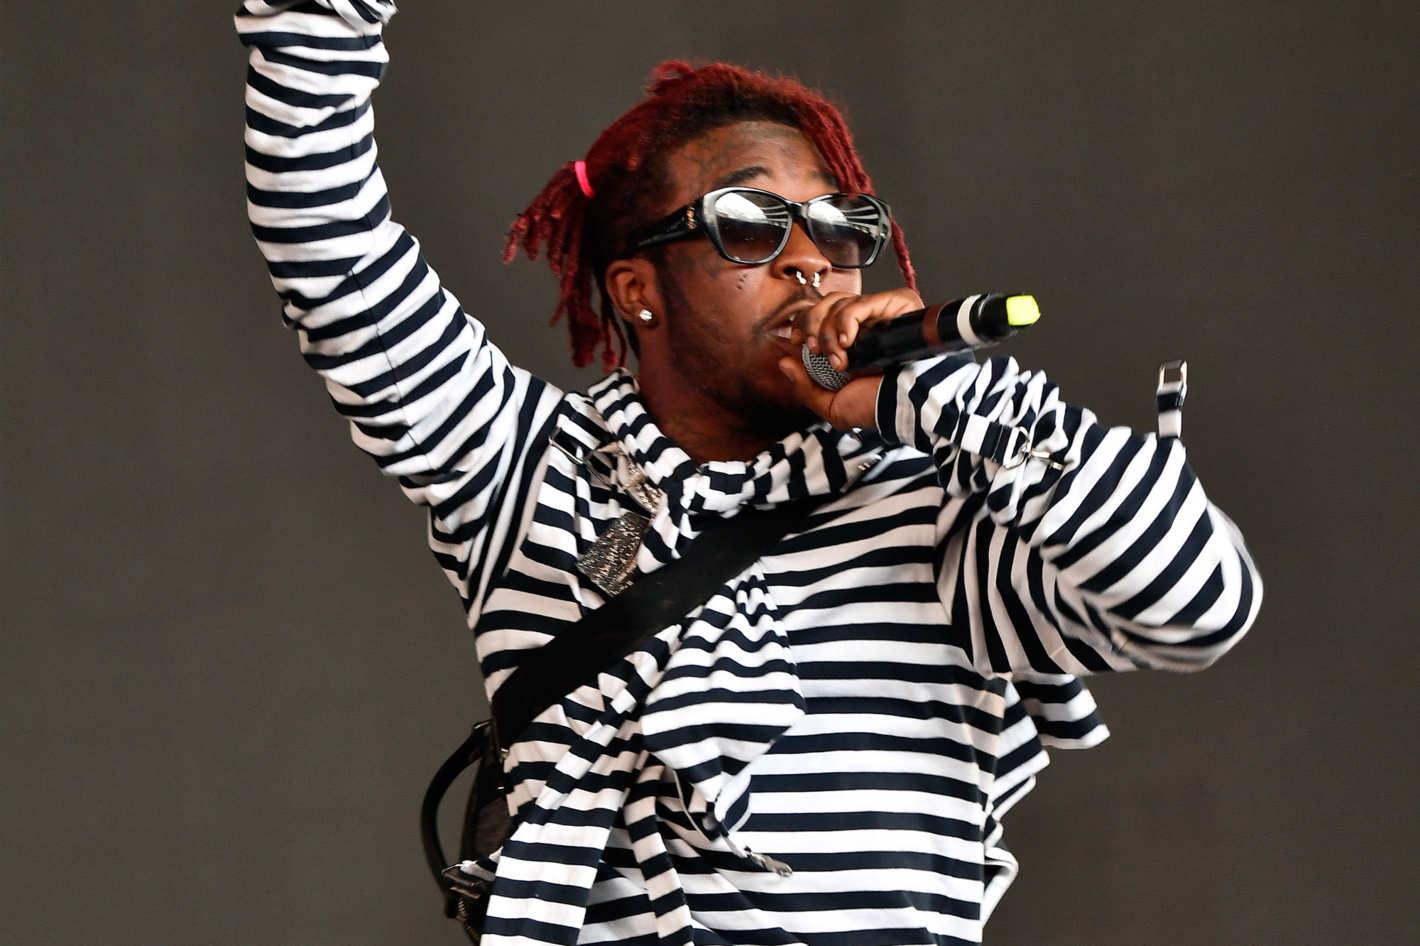 Sorry, Lil Uzi Vert Isn't a 'Rock Star': He's Hip-Hop